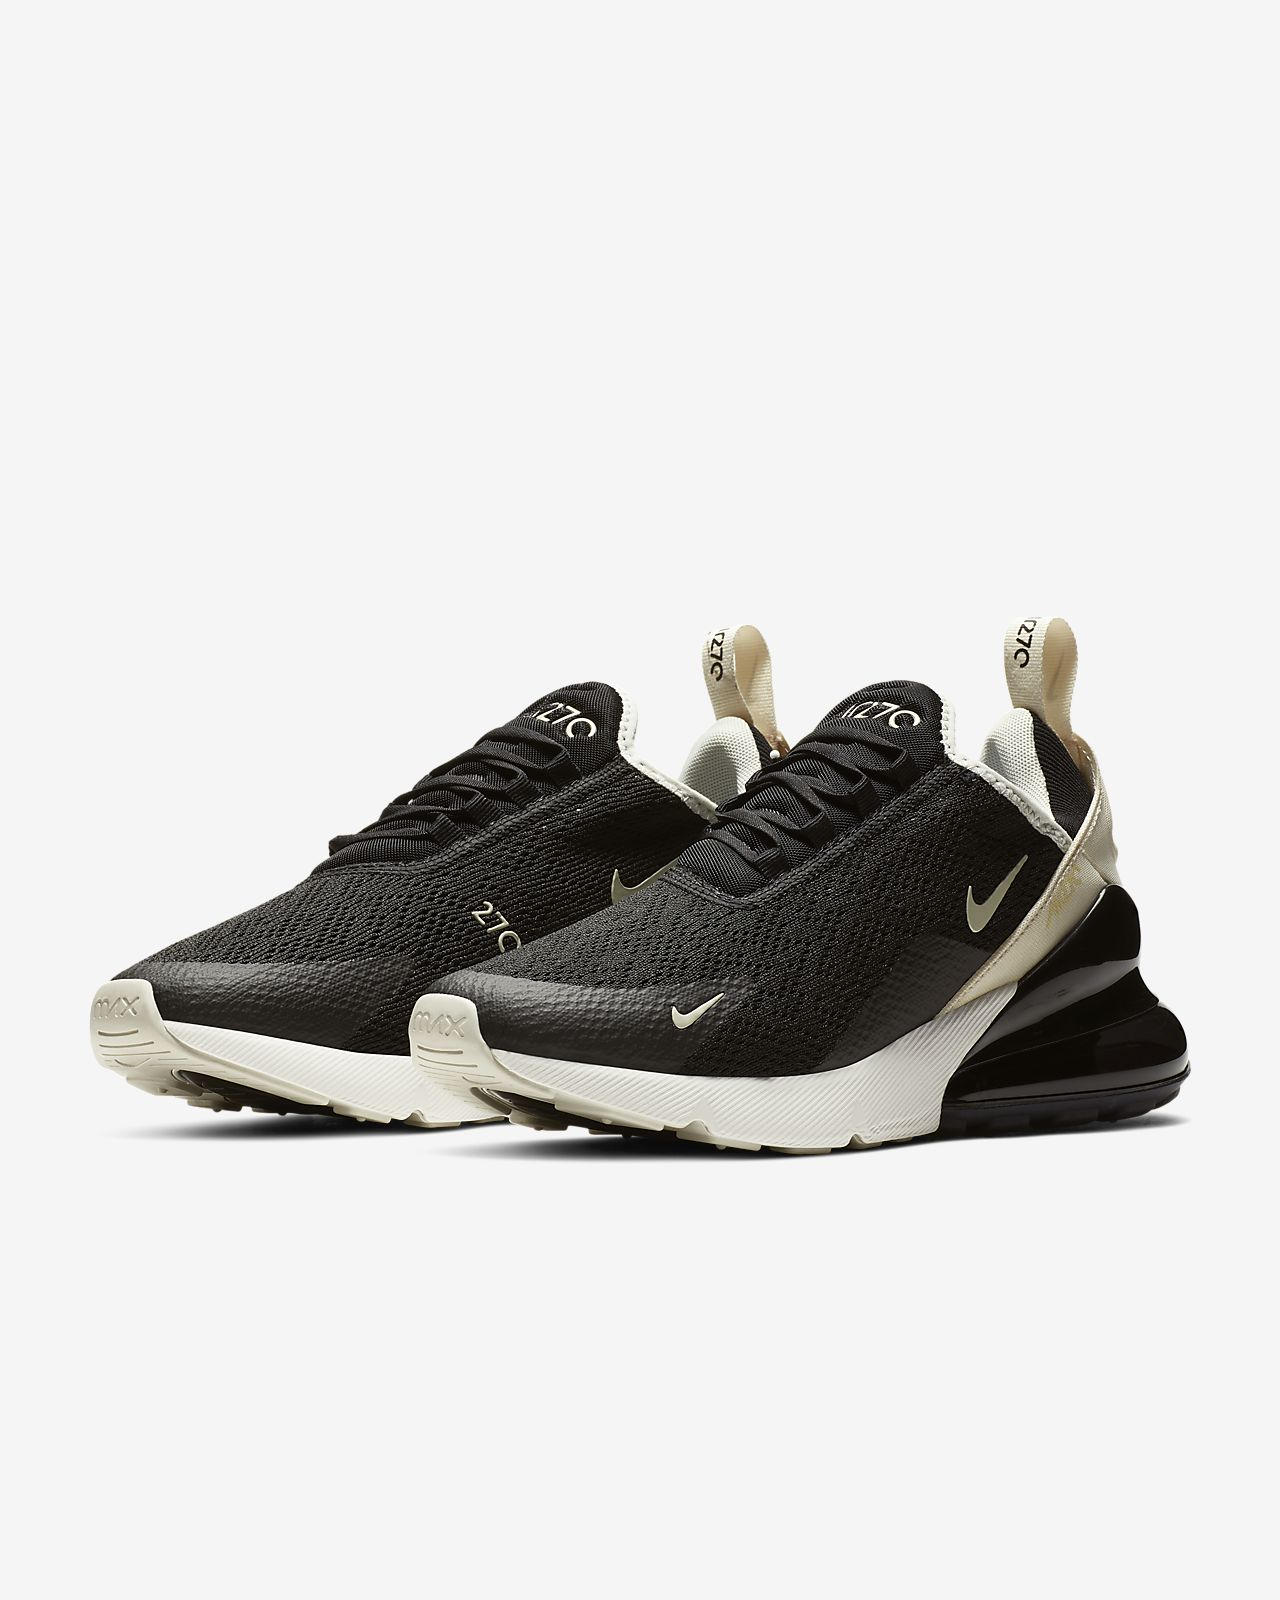 4a6170845ac60 Calzado para mujer Nike Air Max 270. Nike.com MX